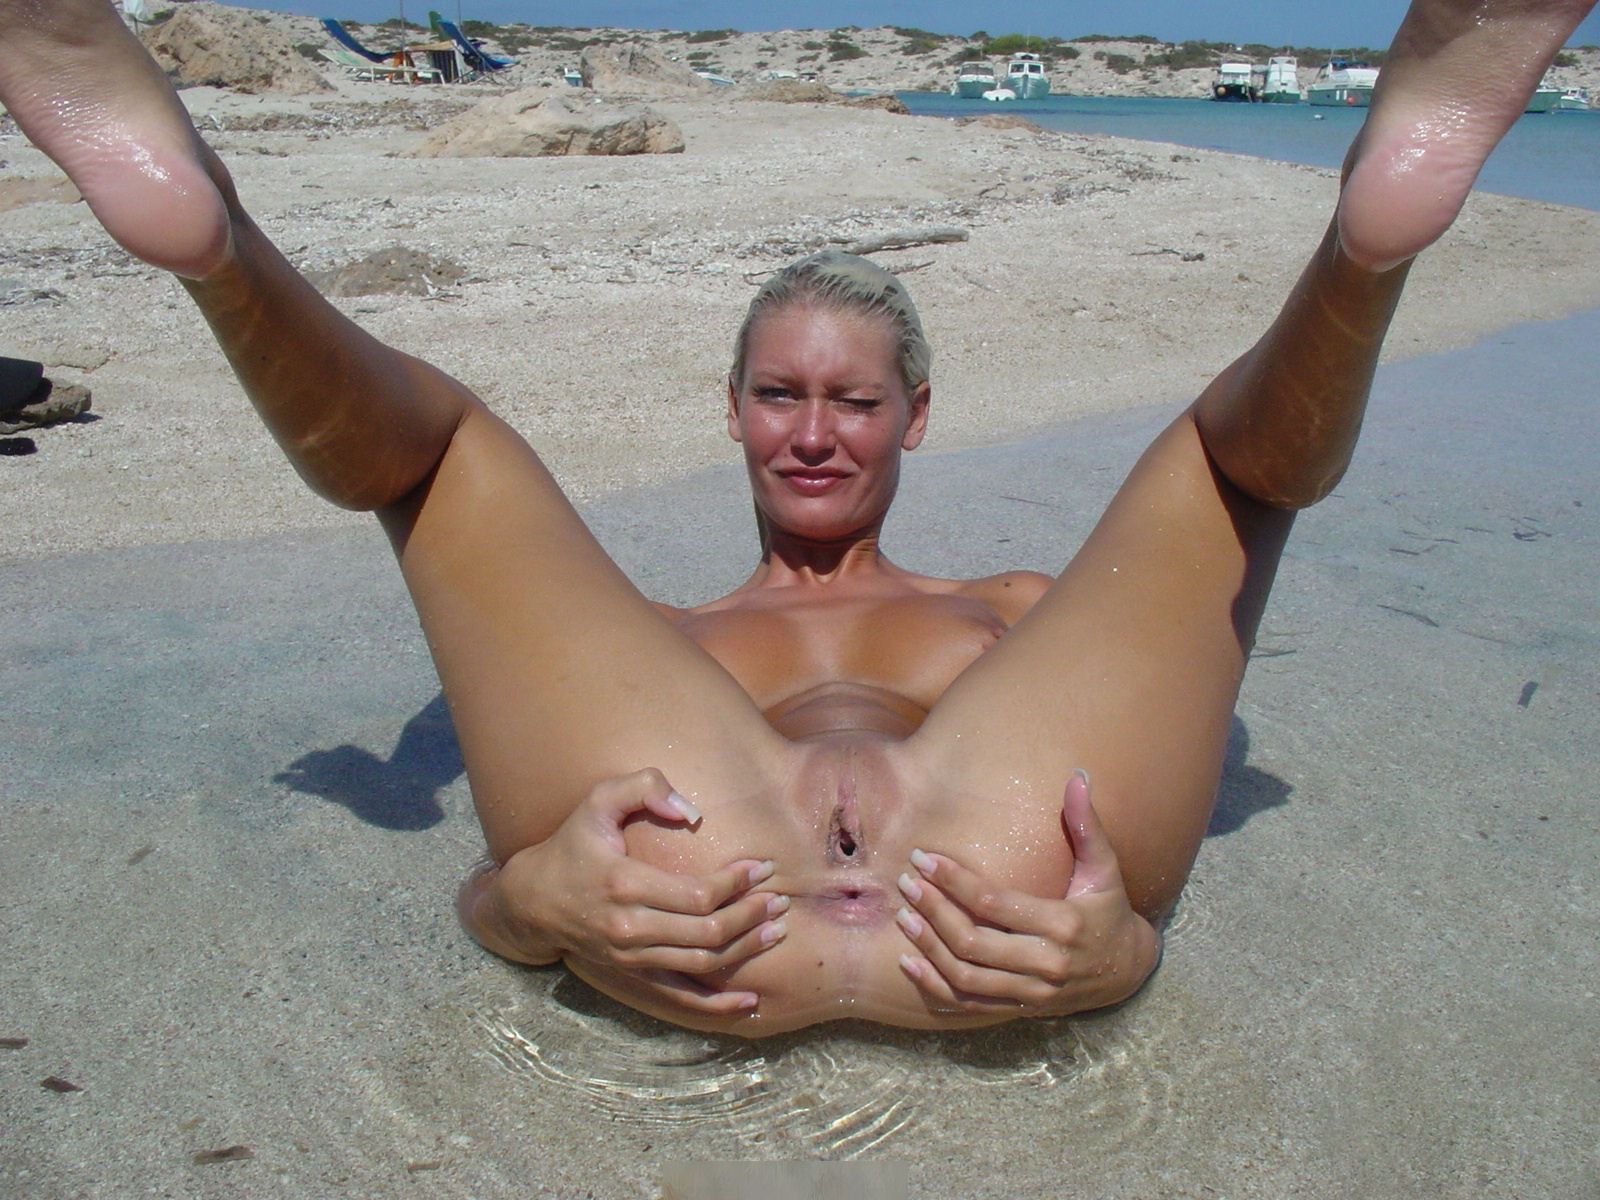 Hot blonde aruba j fucking her ass with dildo 3